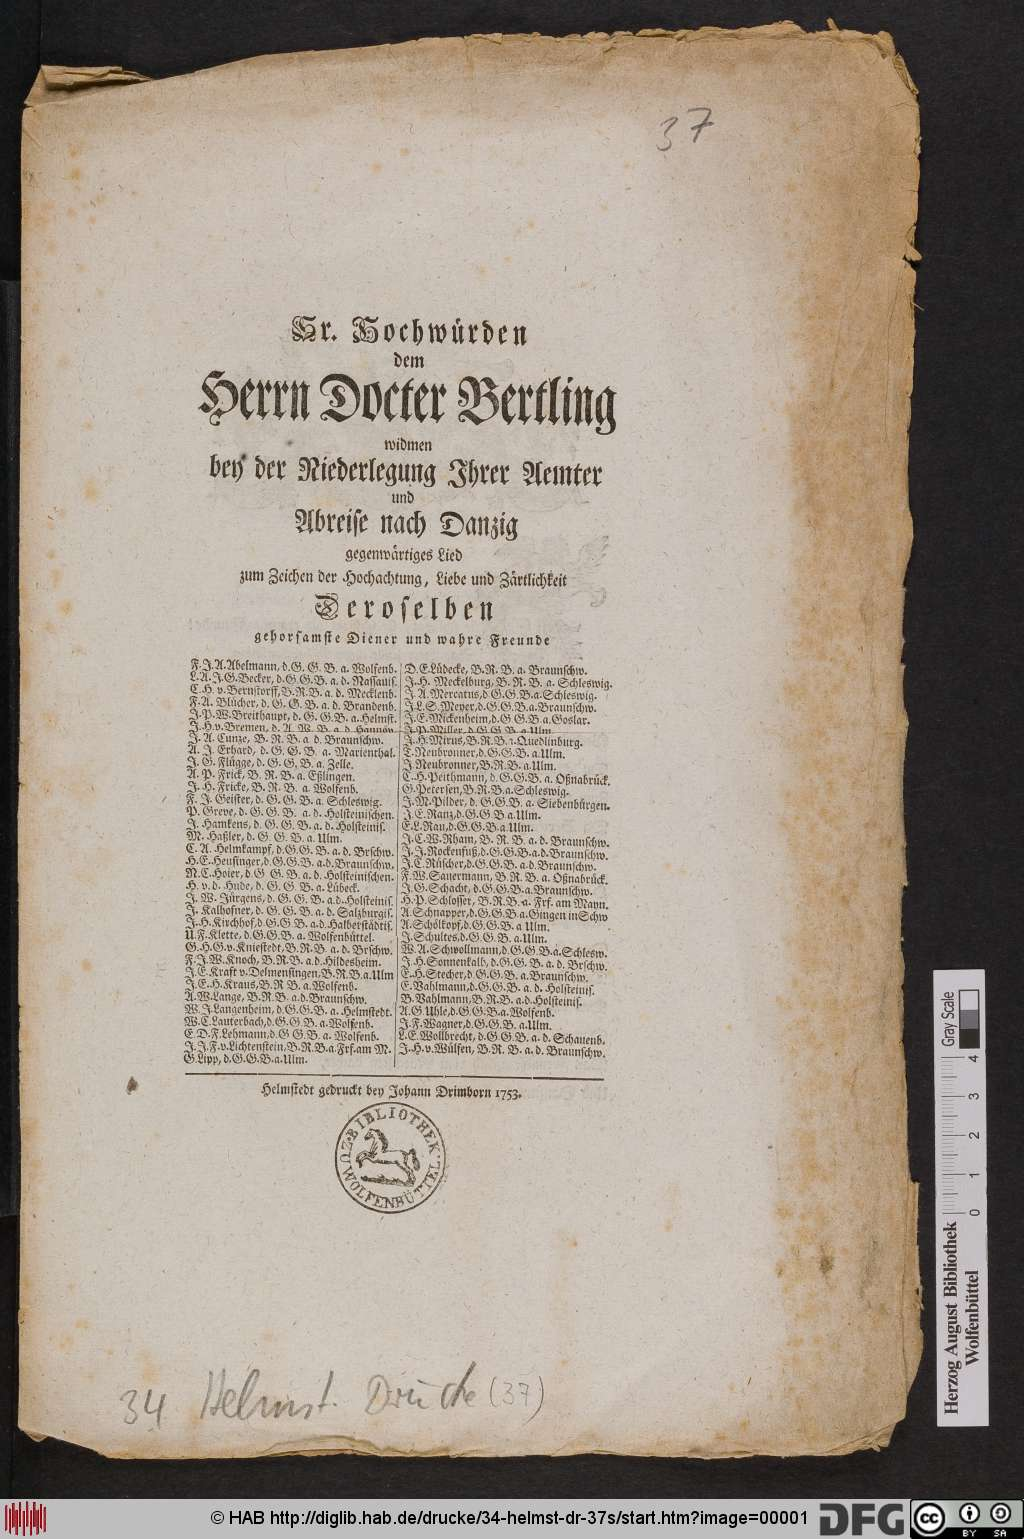 http://diglib.hab.de/drucke/34-helmst-dr-37s/00001.jpg